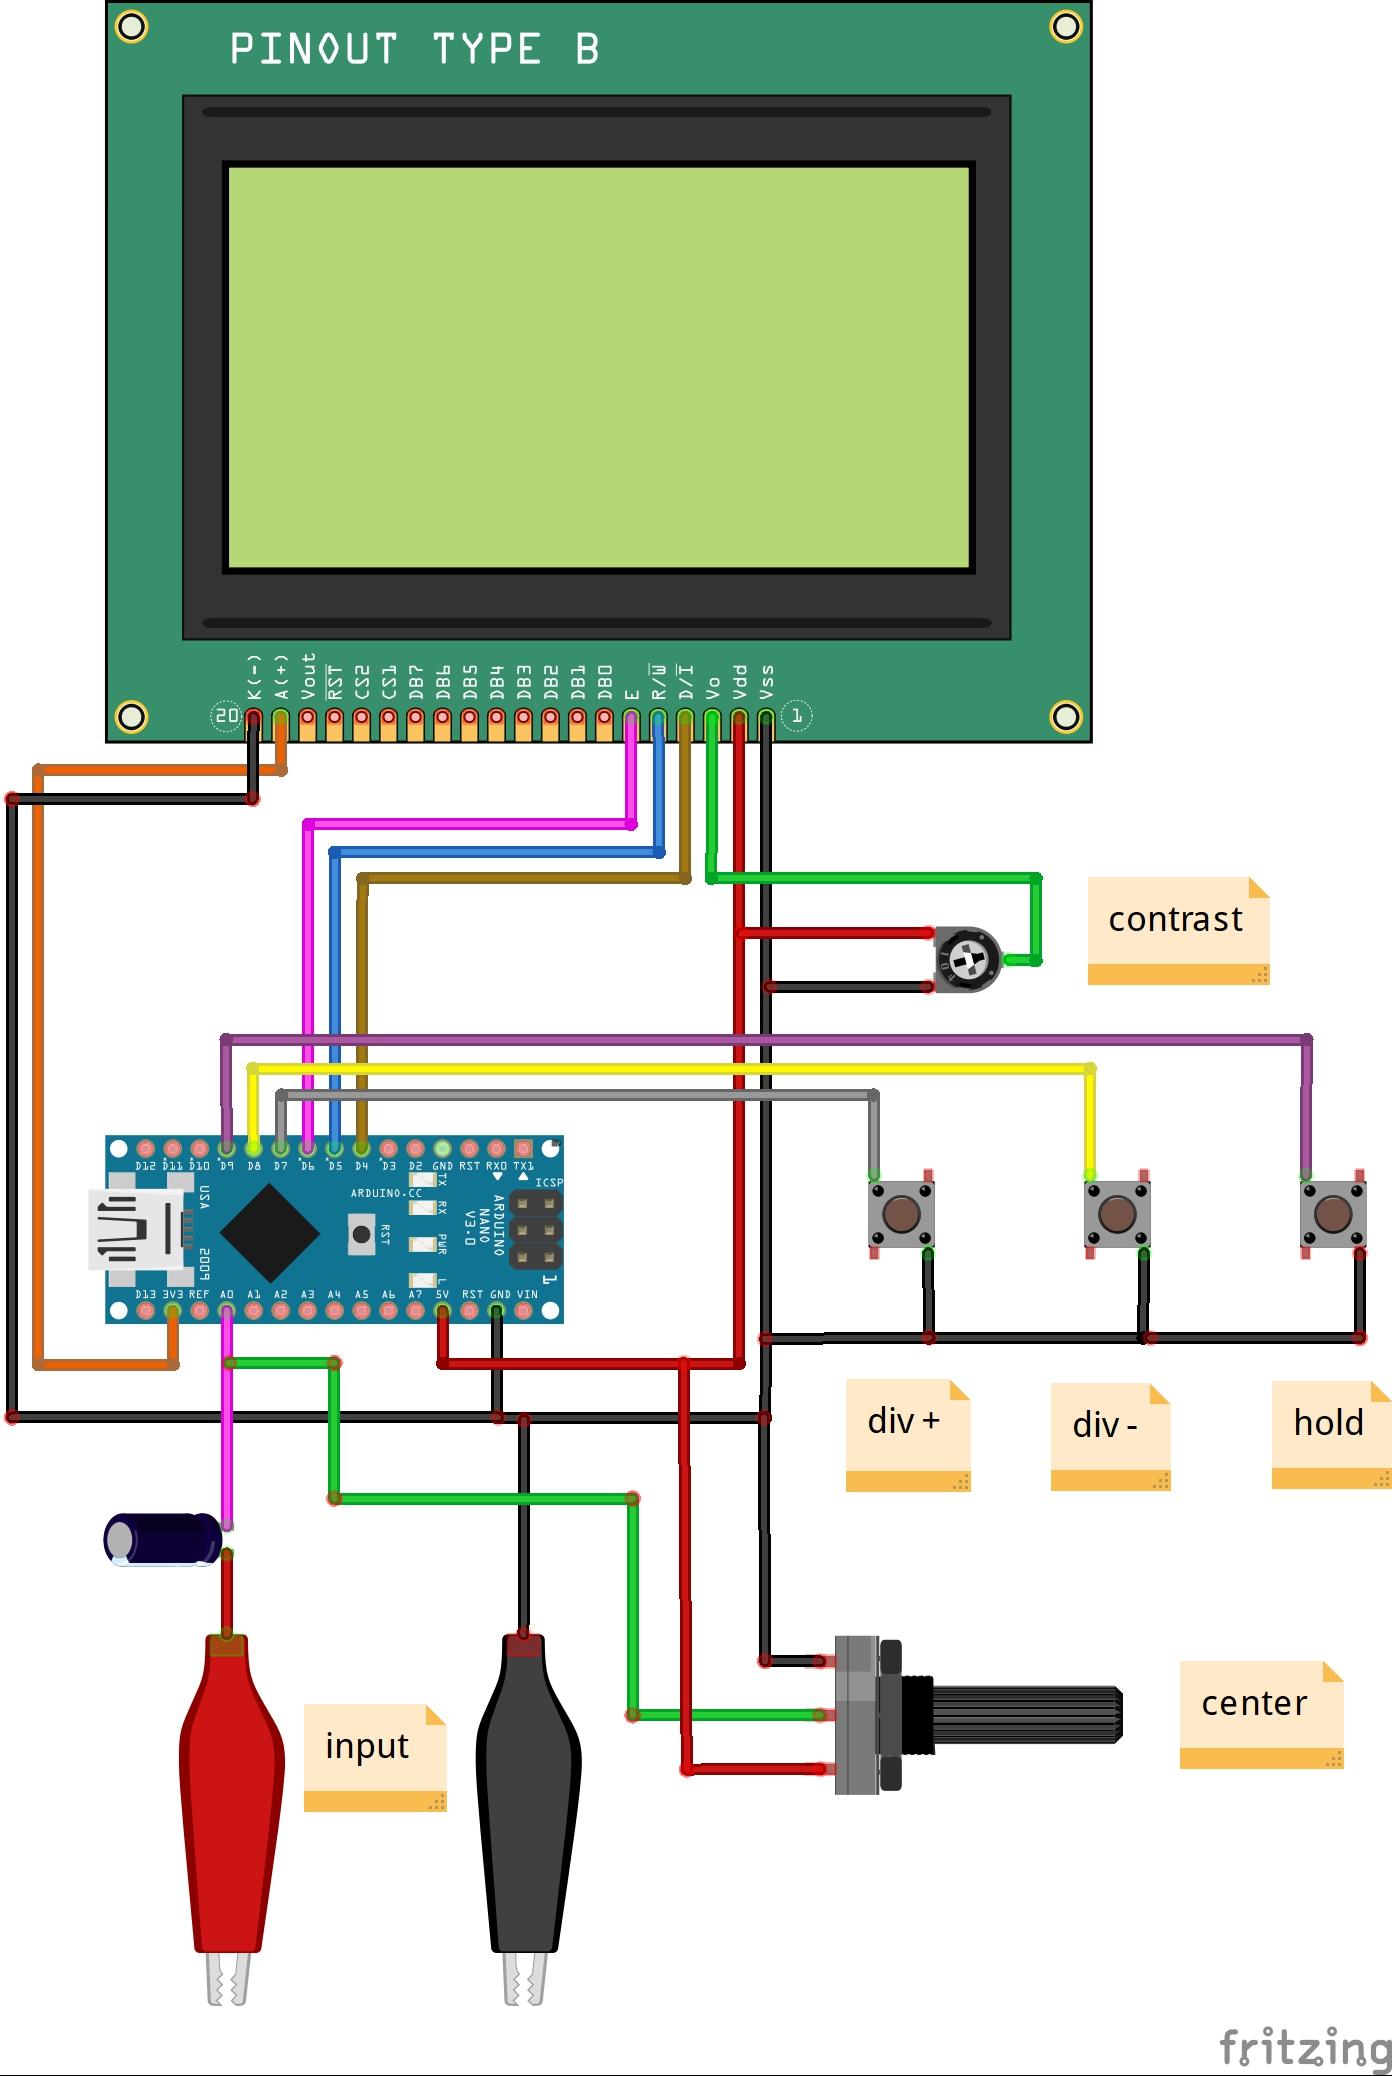 Схема осциллографа 10 Гц – 50 кГц на основе платы Arduino Nano и ЖК дисплея ST7920